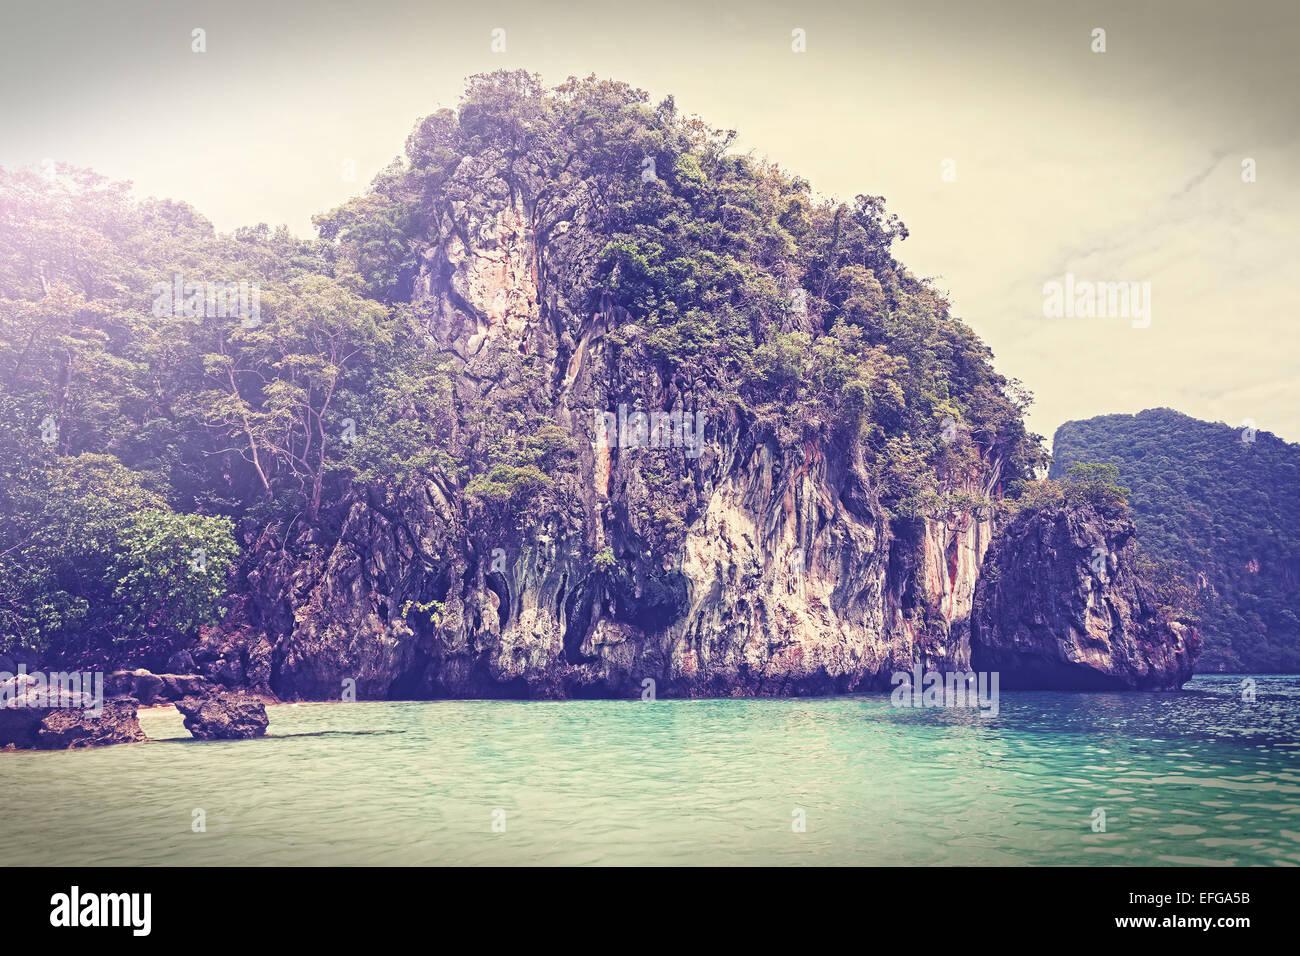 Vintage gefilterte Bild der Insel, Andaman Meer Thailand. Stockbild